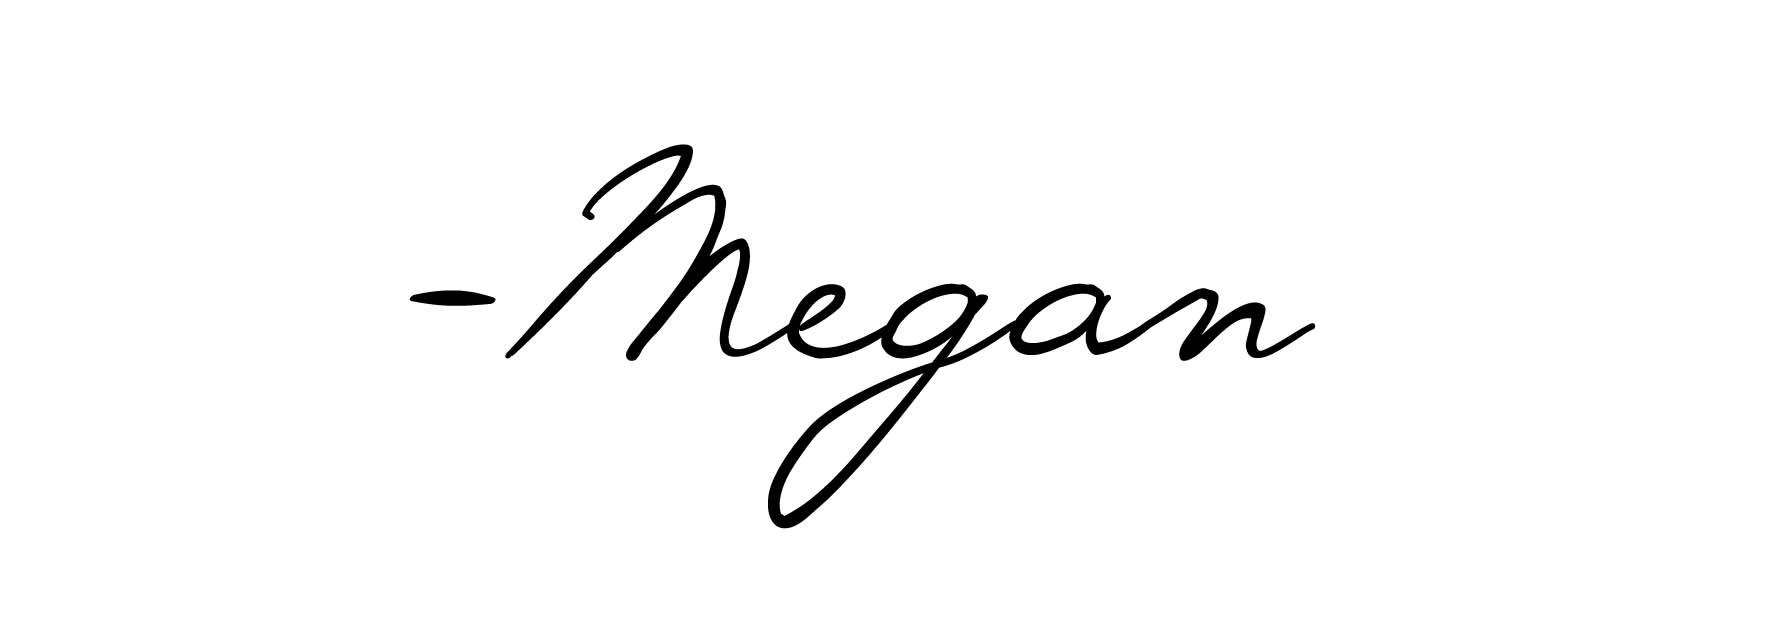 darling be brave blog signature